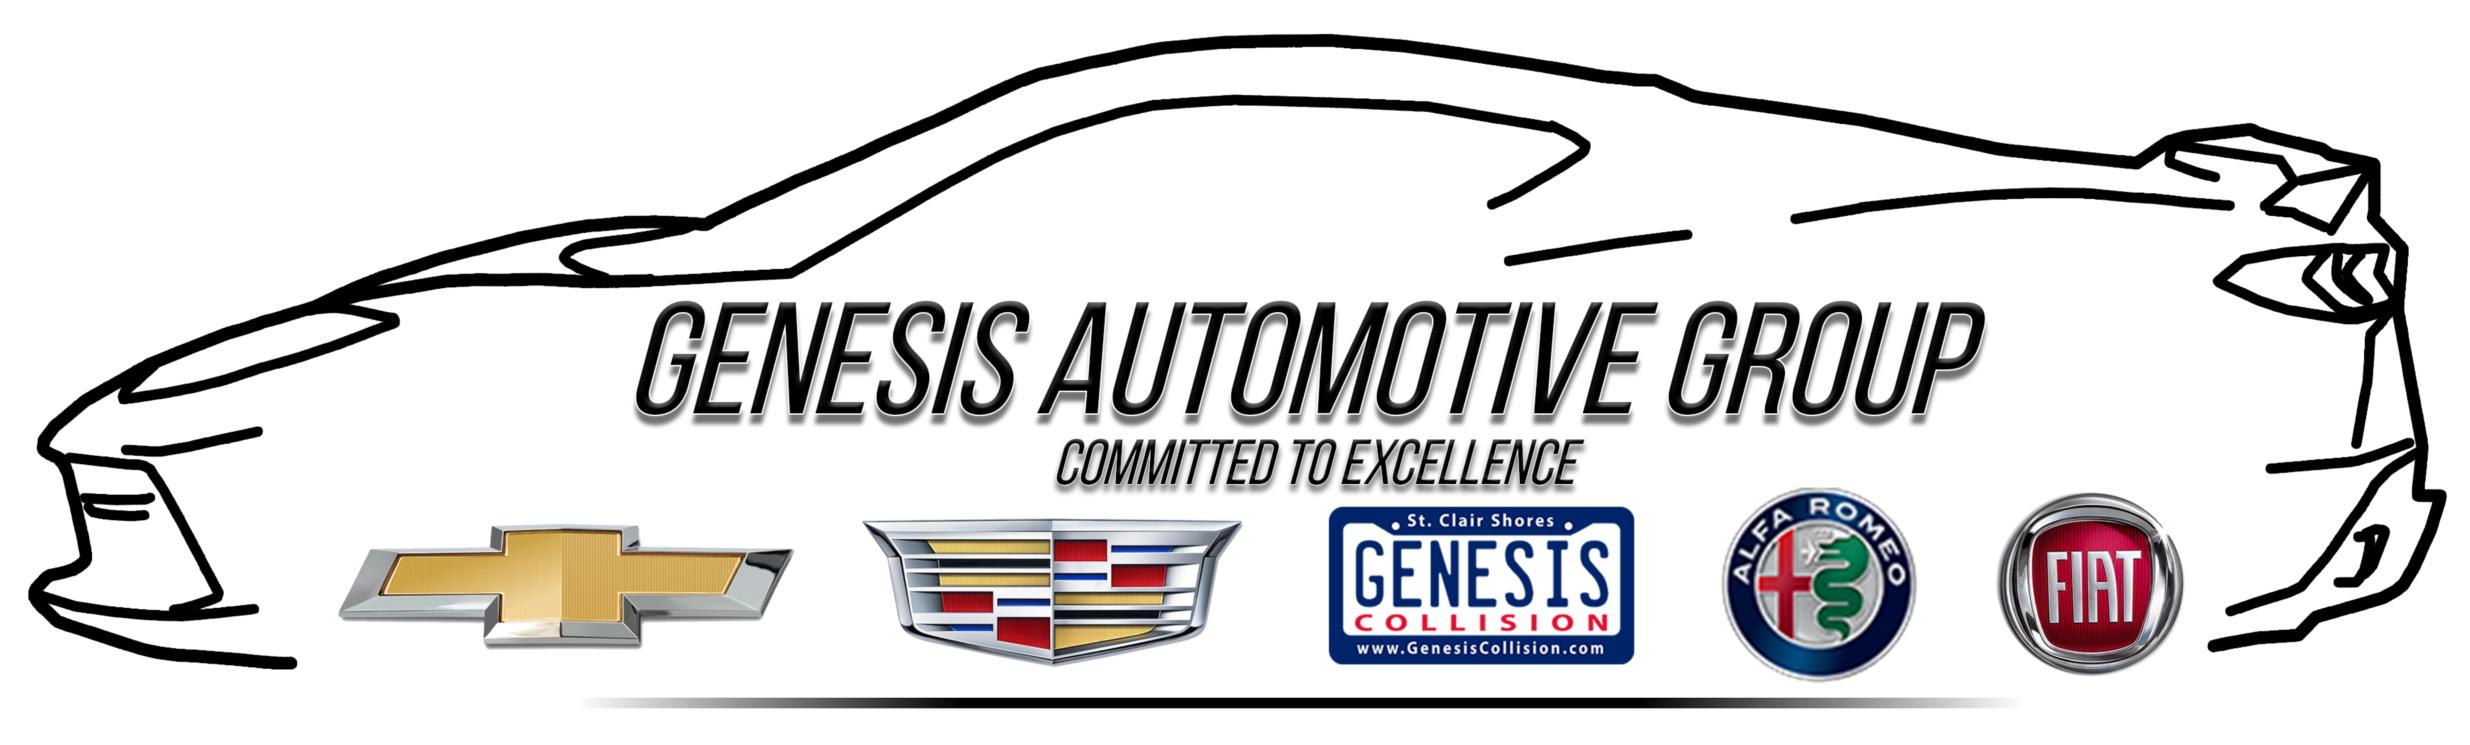 Genesis Automotive Group logo